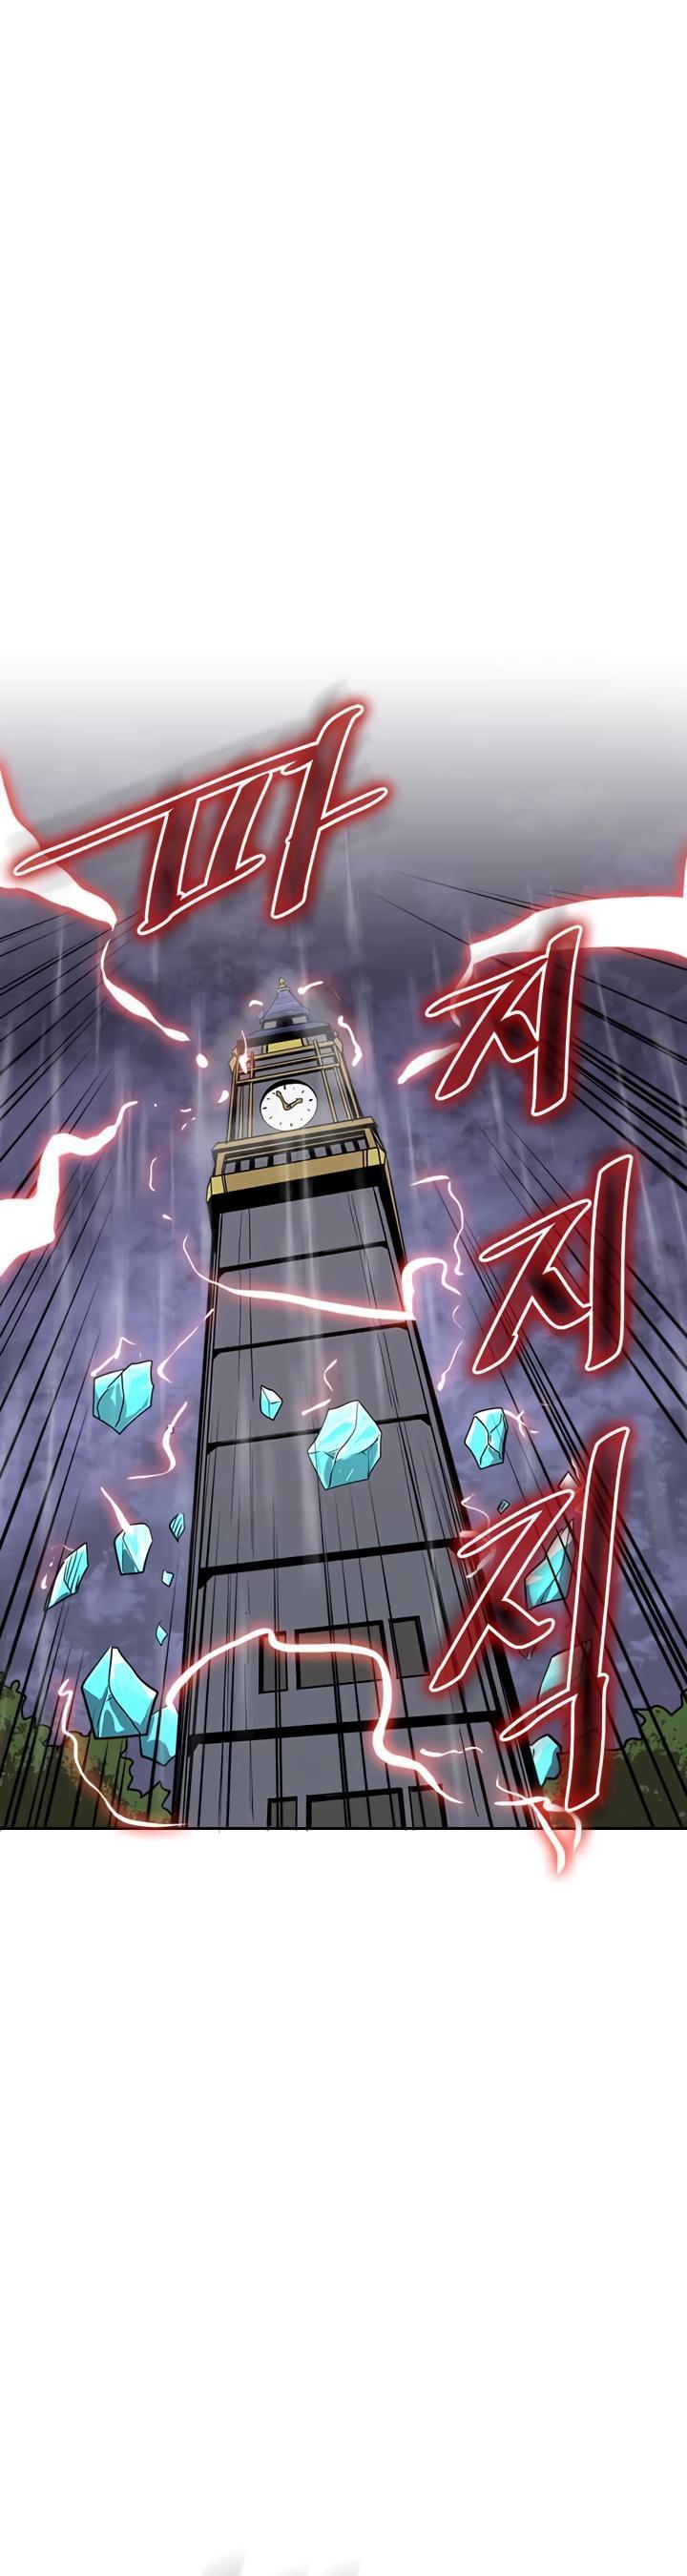 A Returner's Magic Should Be Special Chapter 37 page 31 - Mangakakalots.com